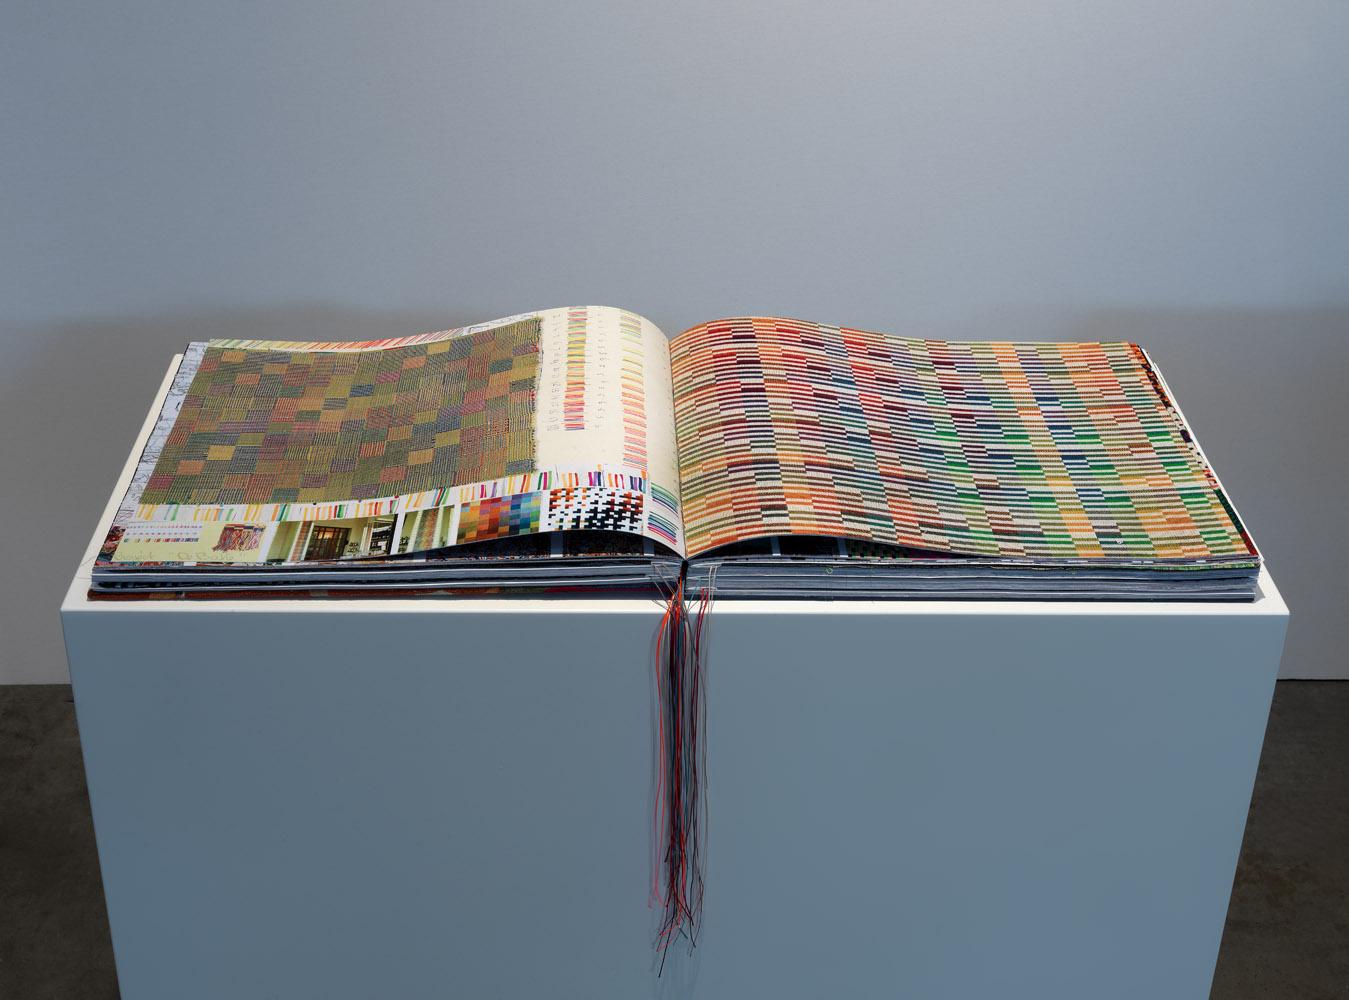 012.B.BROEKMAN-ART ON PAPER 2019-PH.GJ.vanROOIJ.jpg